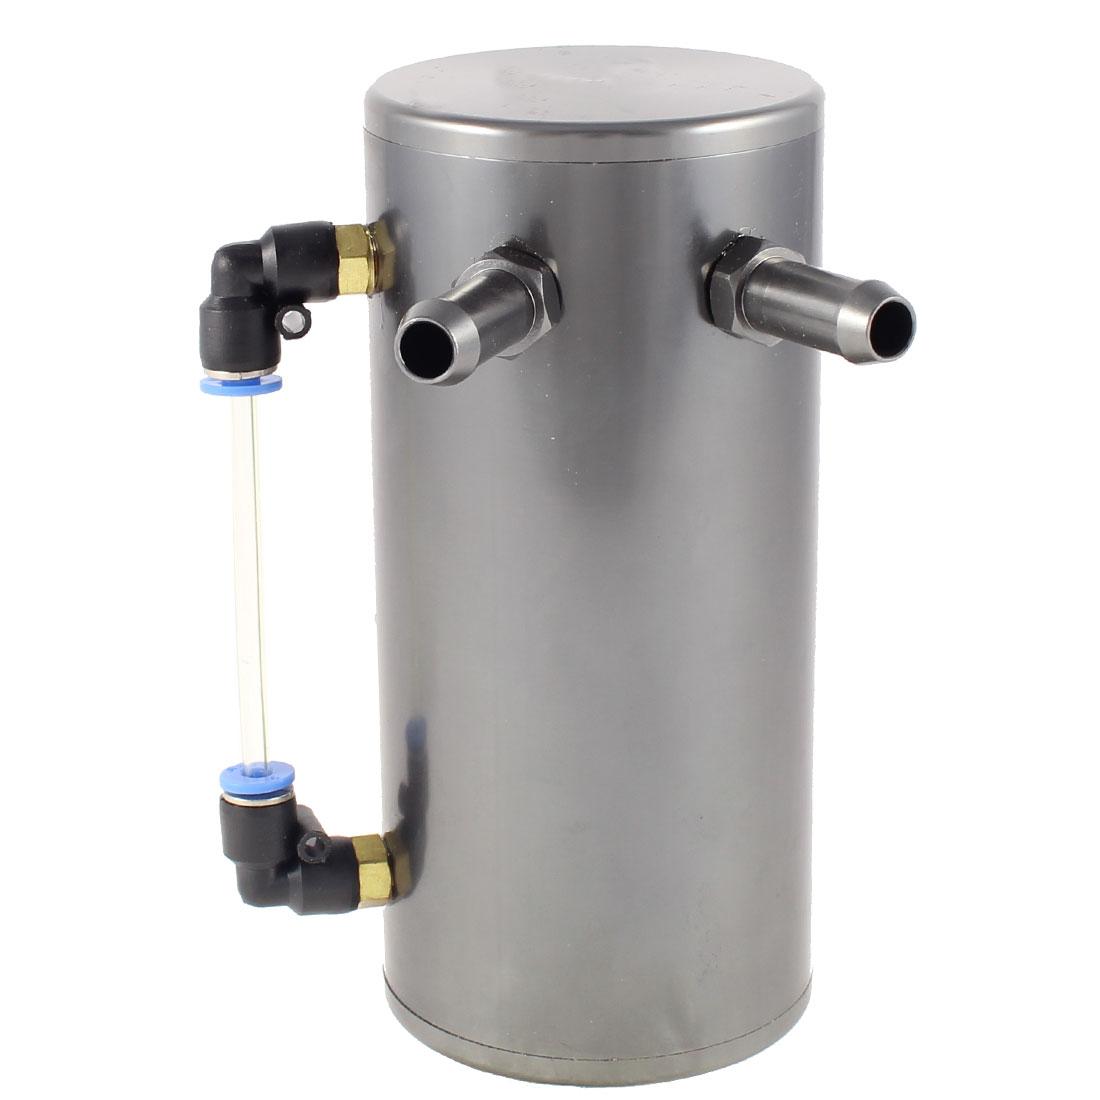 Universal Mounting Bracket Gray Alloy Body Oil Catch Can Tank Oil Reservoir